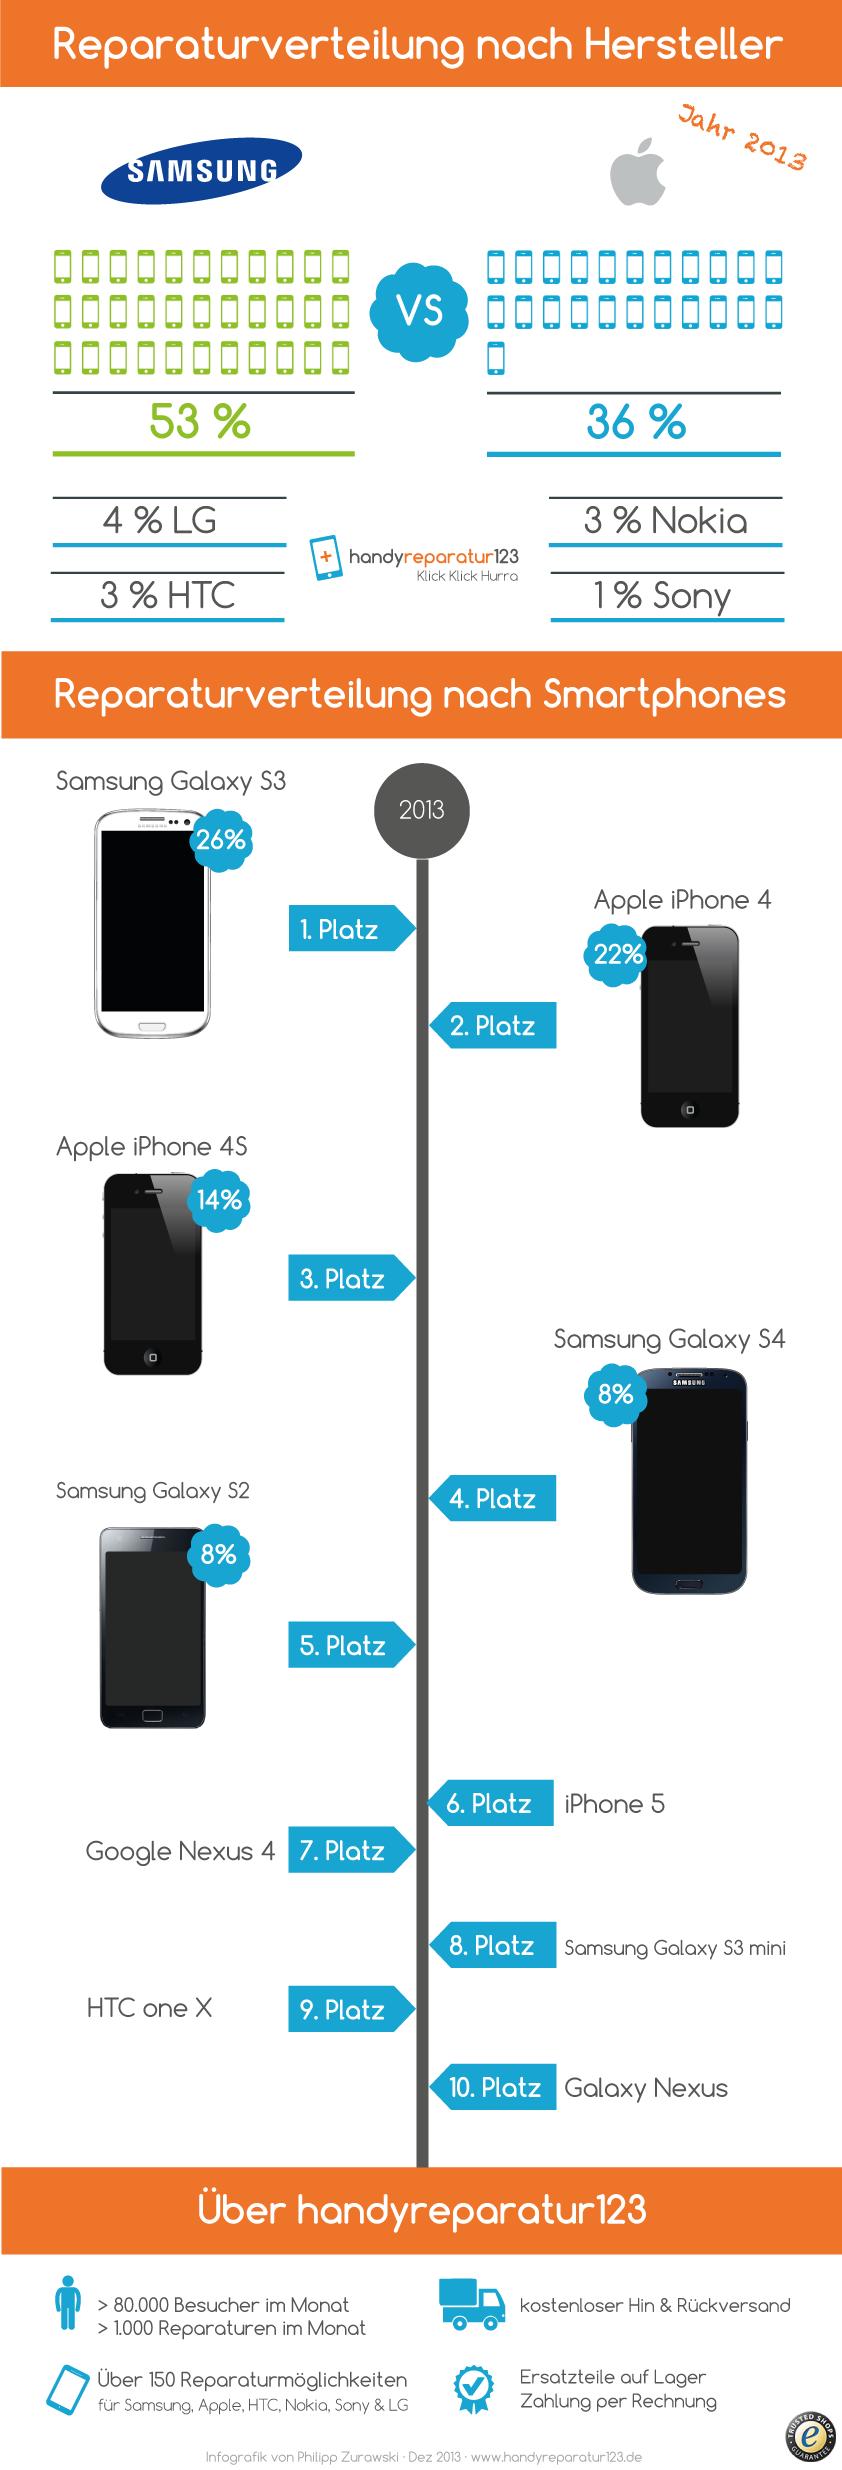 infografik-2013-handyreparatur123